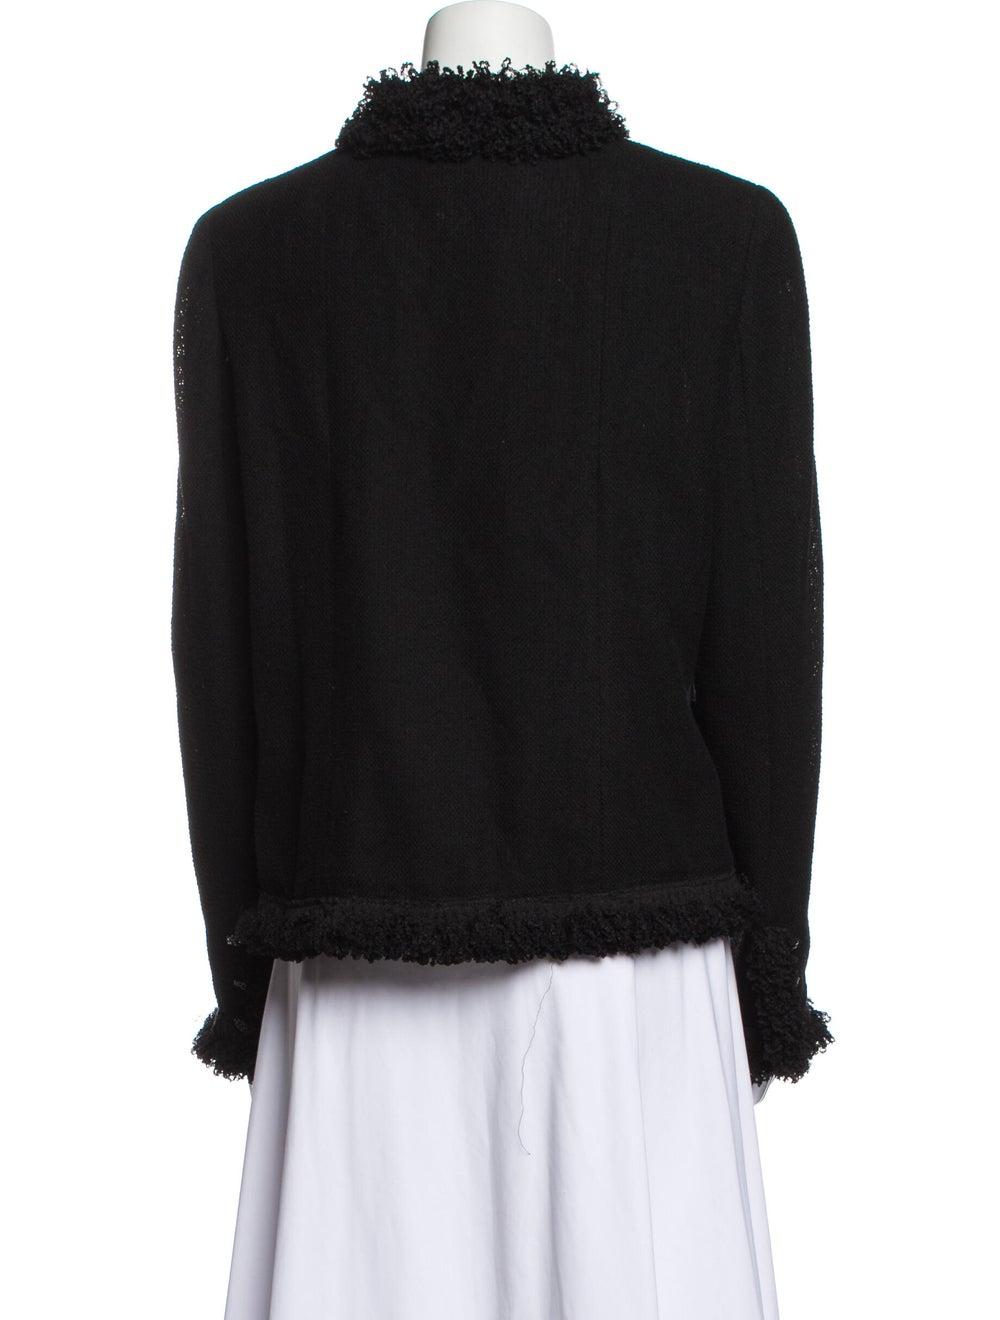 Chanel Vintage 2003 Evening Jacket Wool - image 3